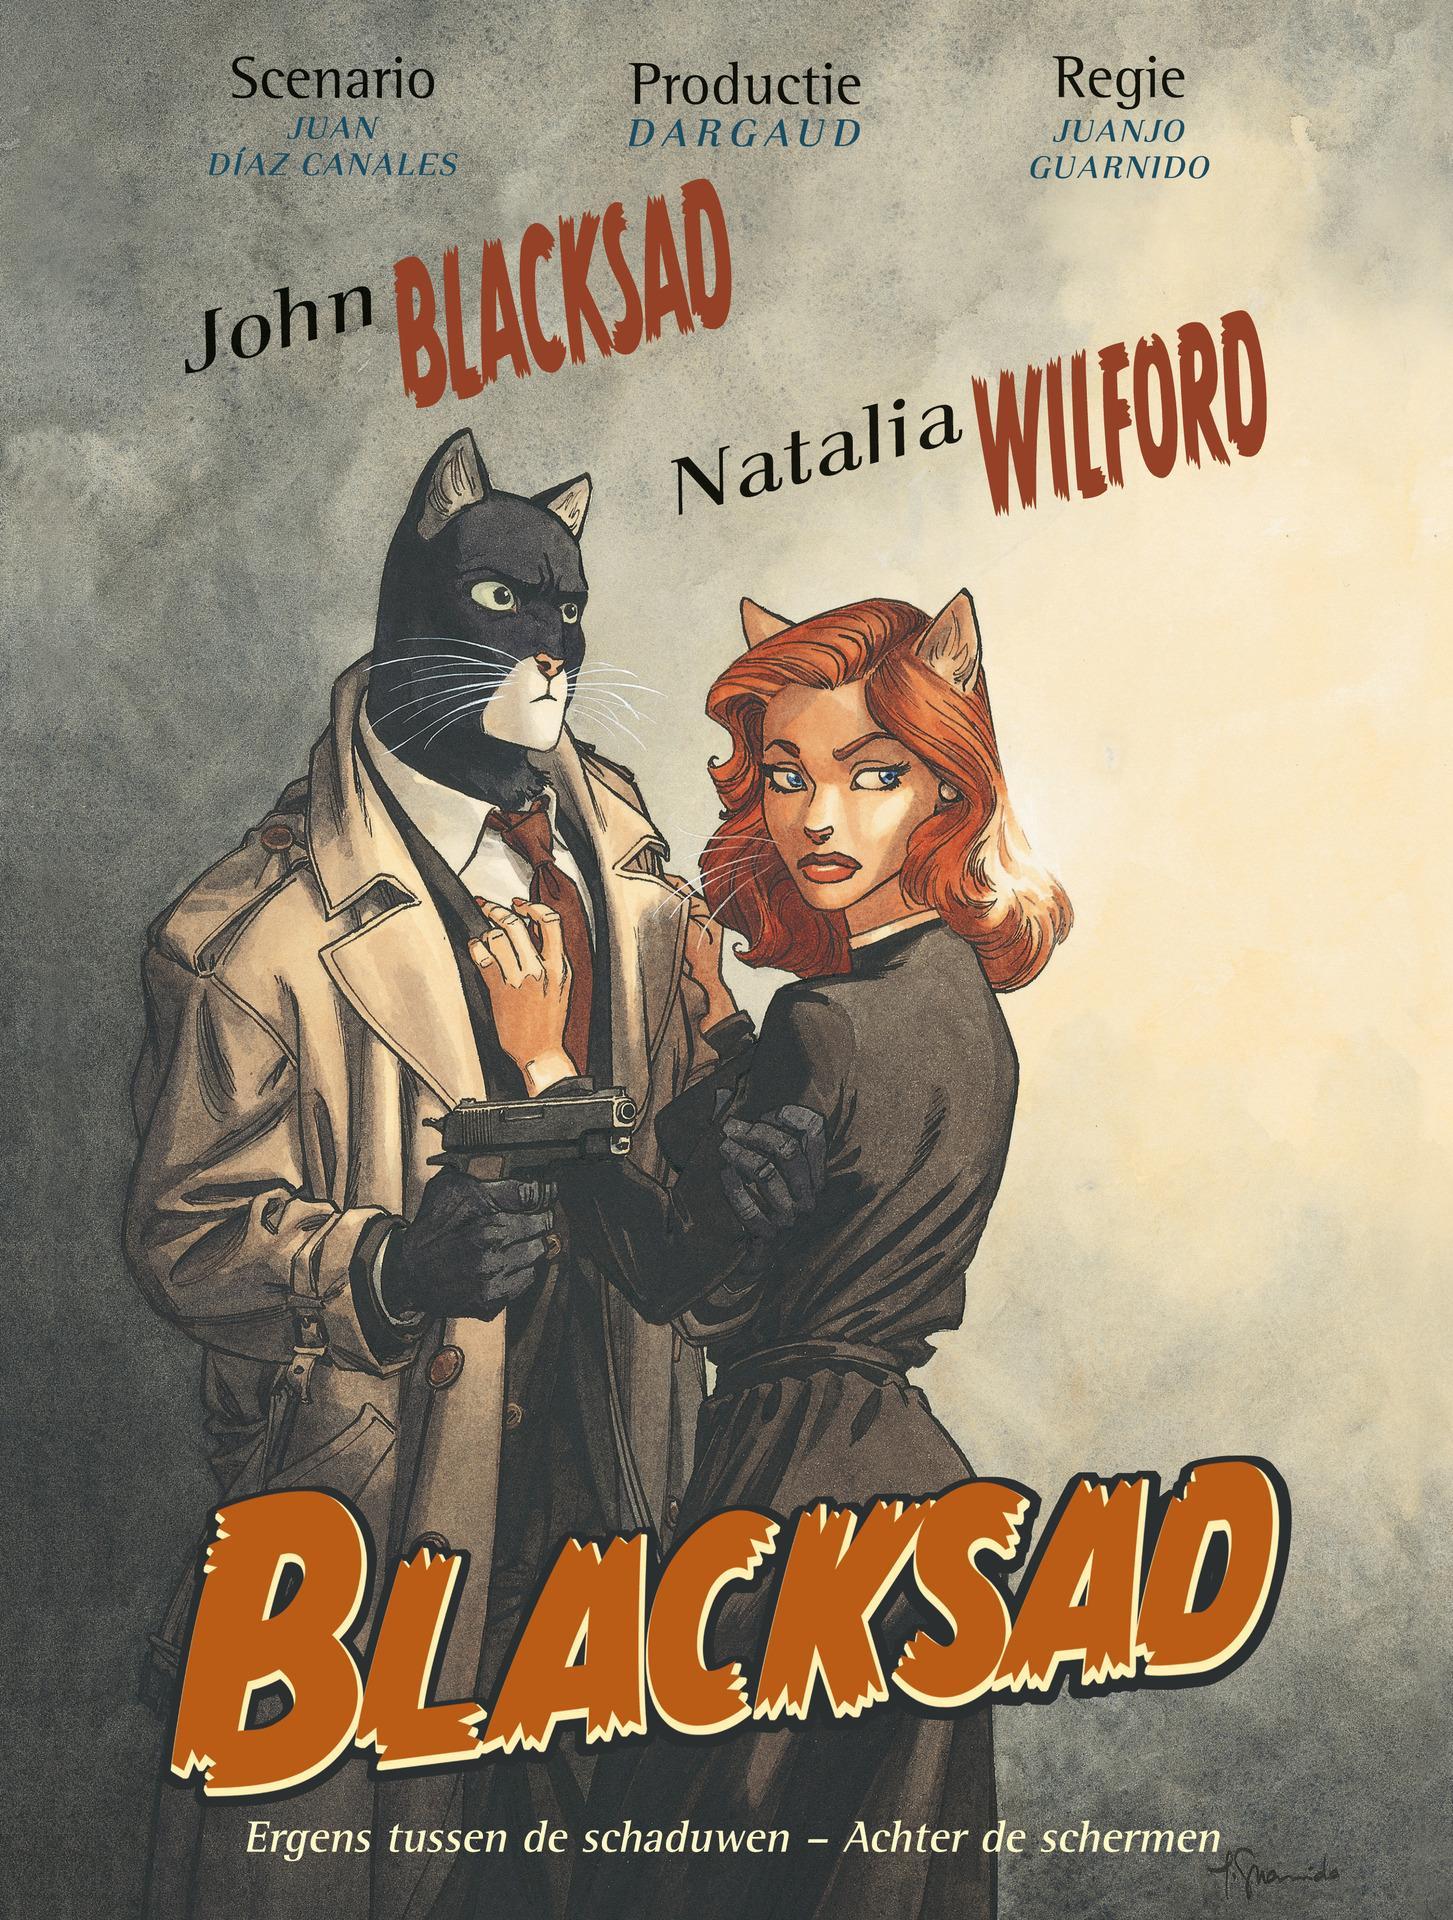 Blacksad A01 Ergens Tussen De Schaduwen  Achter De Schermen